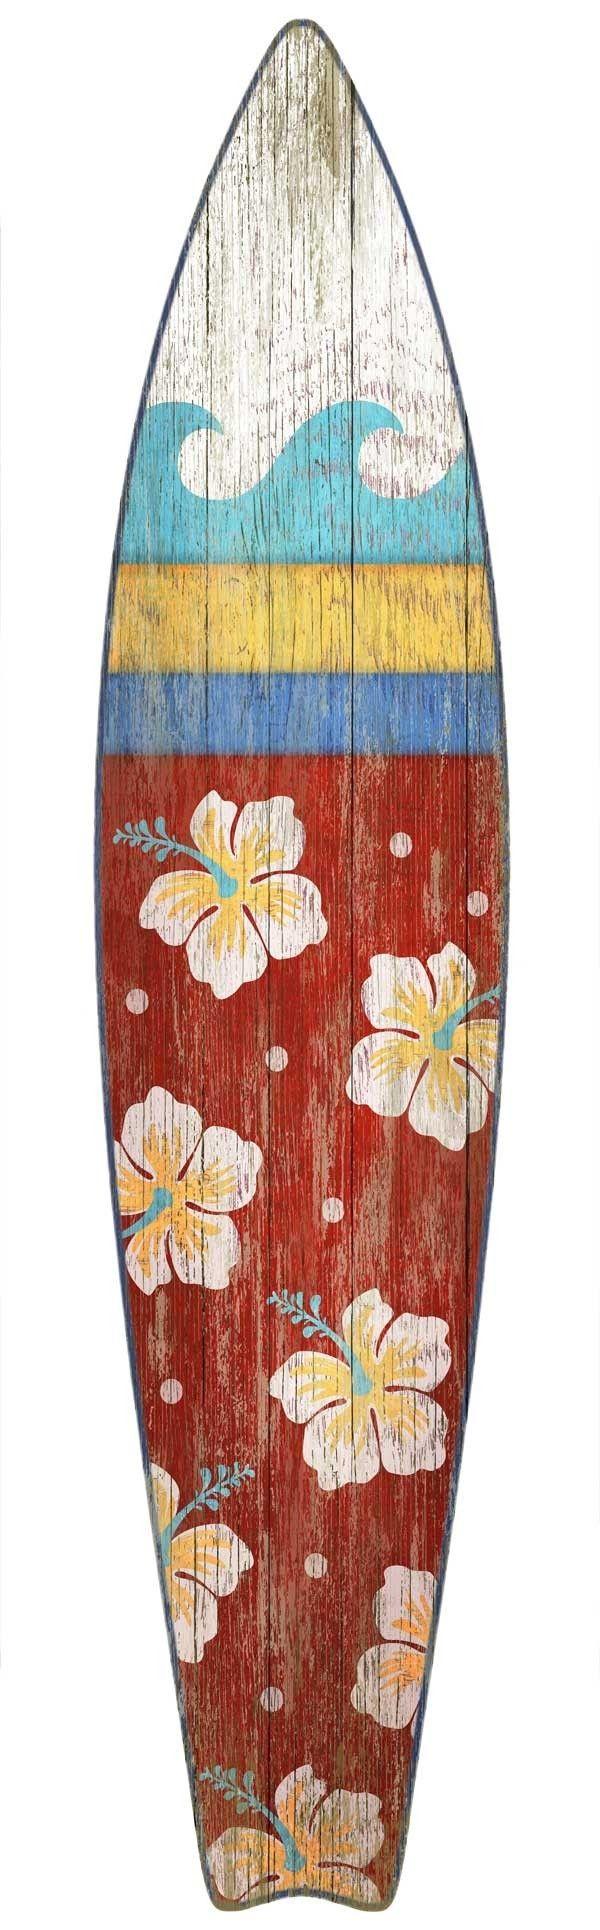 Aloha! Hawaiian Style Surf Board Wall Art from Suzanne Nicoll